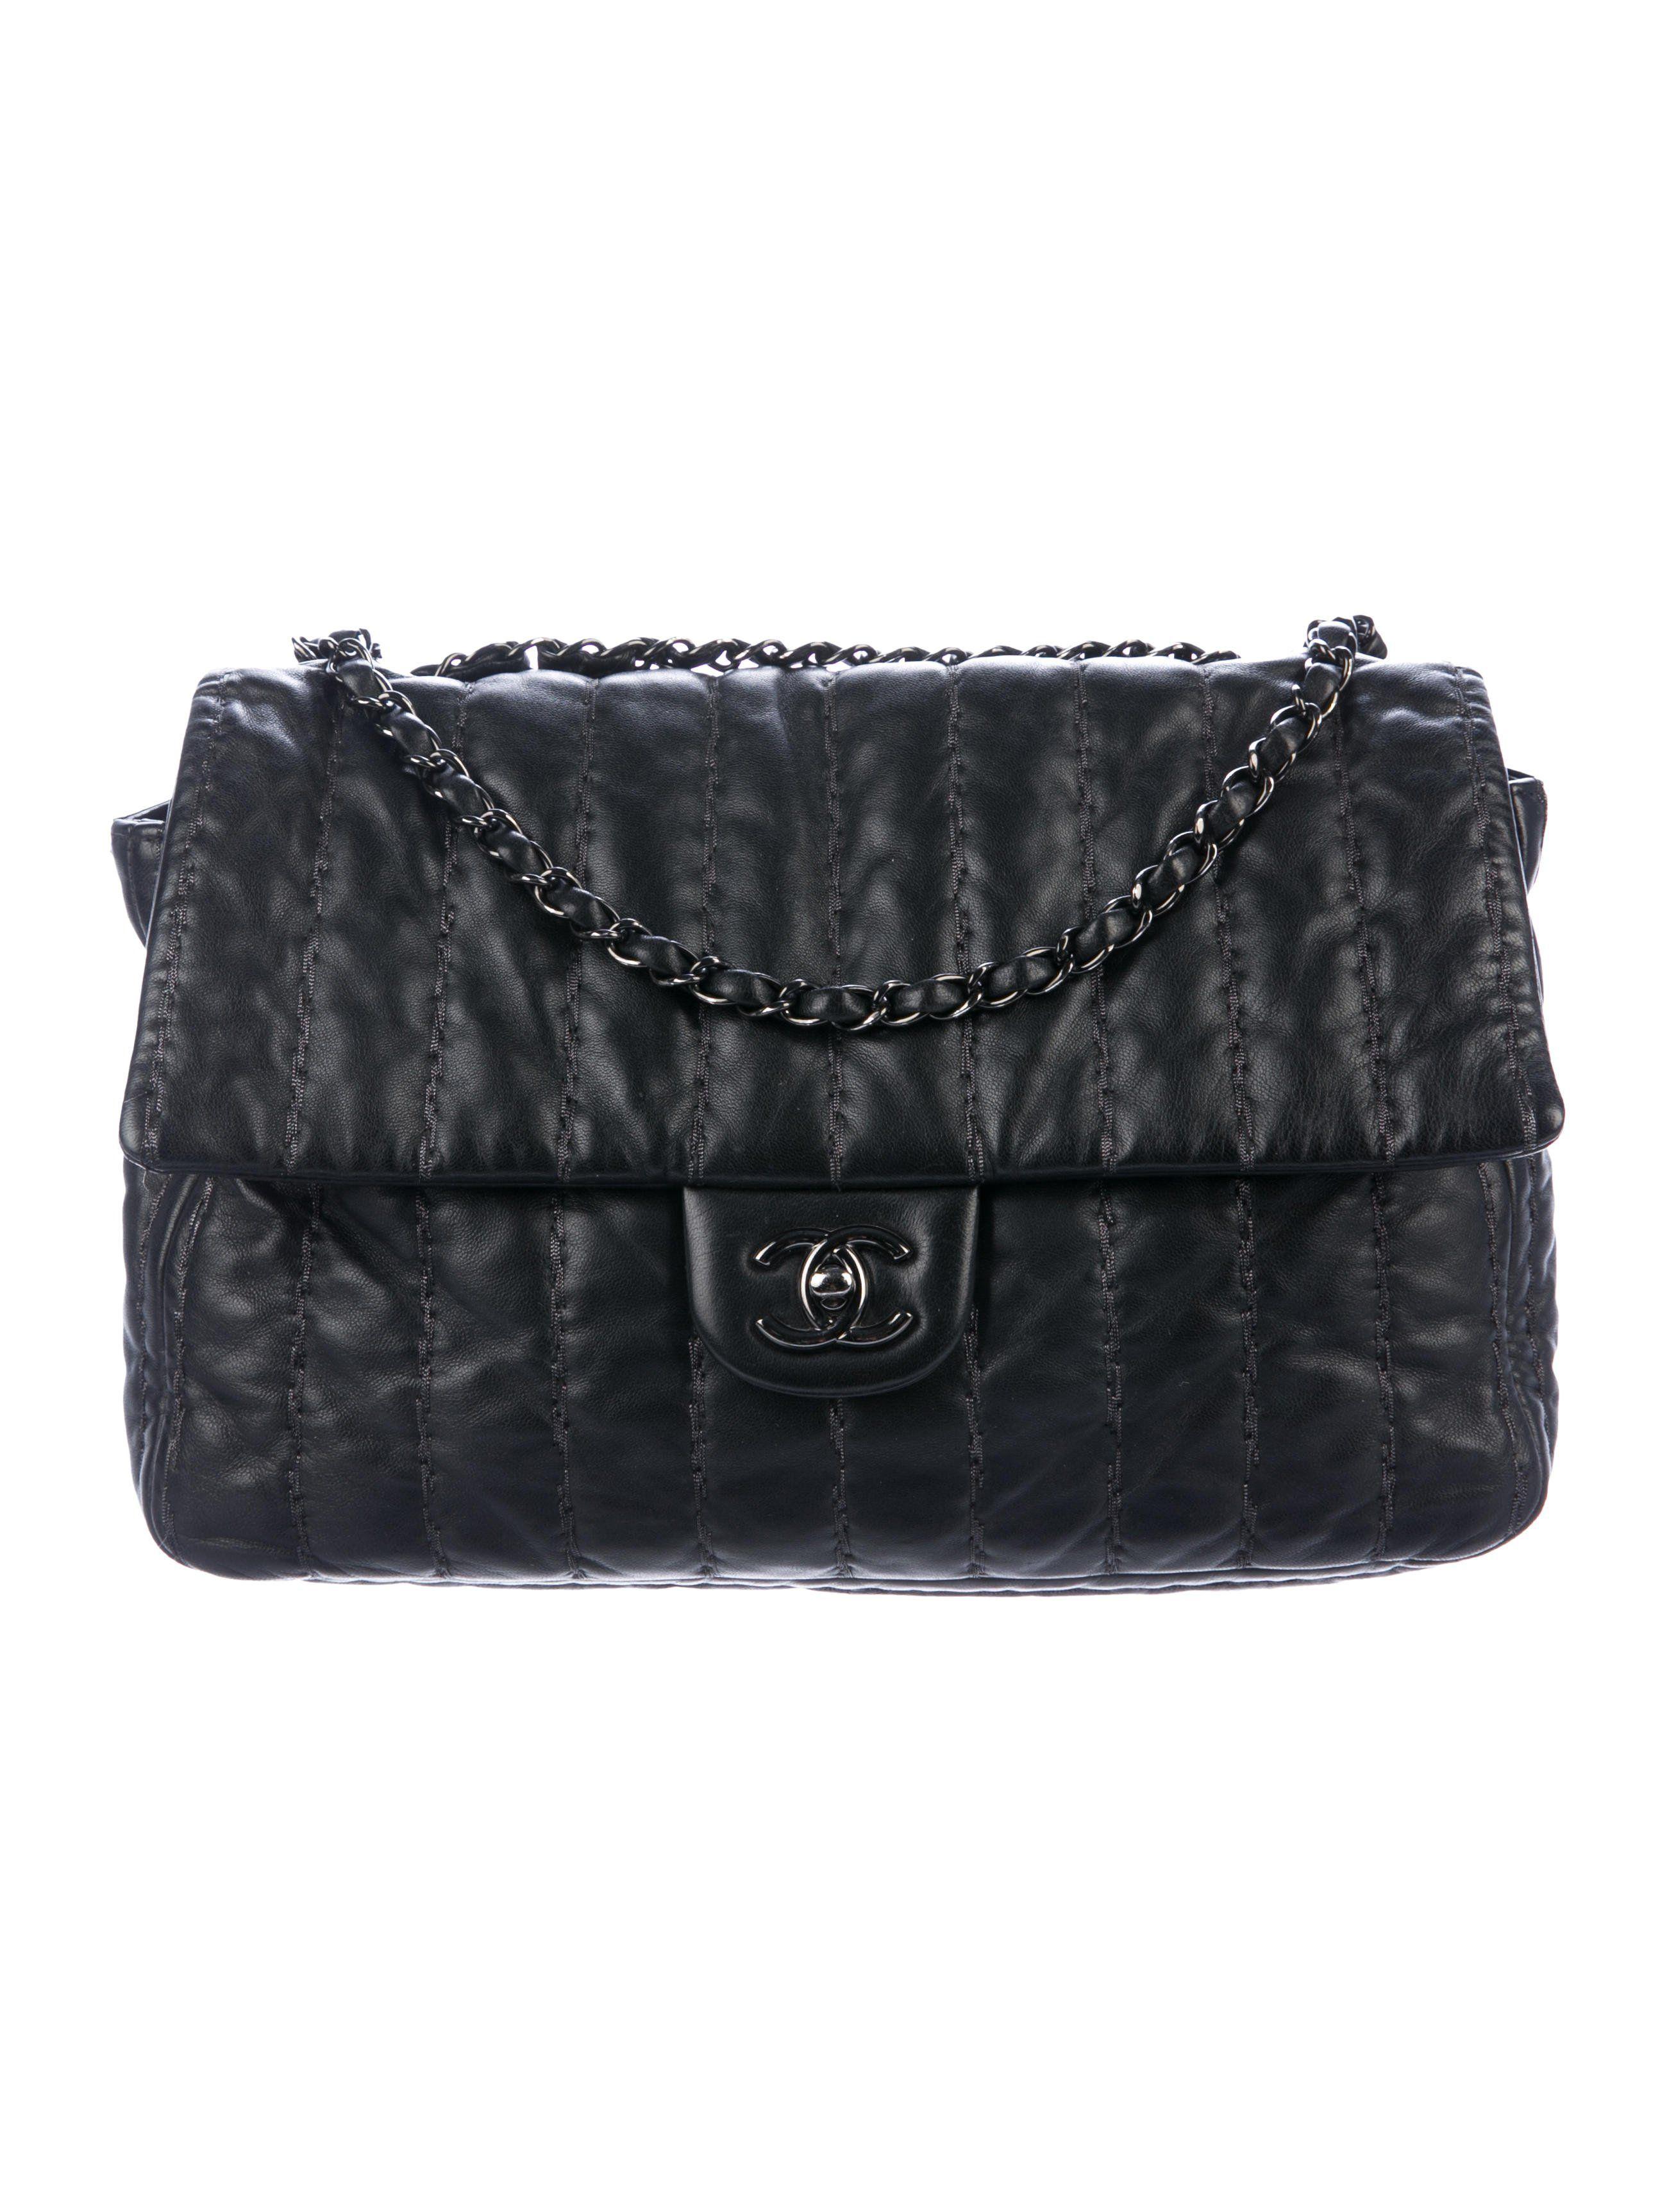 Vertical Stitch Jumbo Flap Bag Flap bag, Bags, Shoulder bag